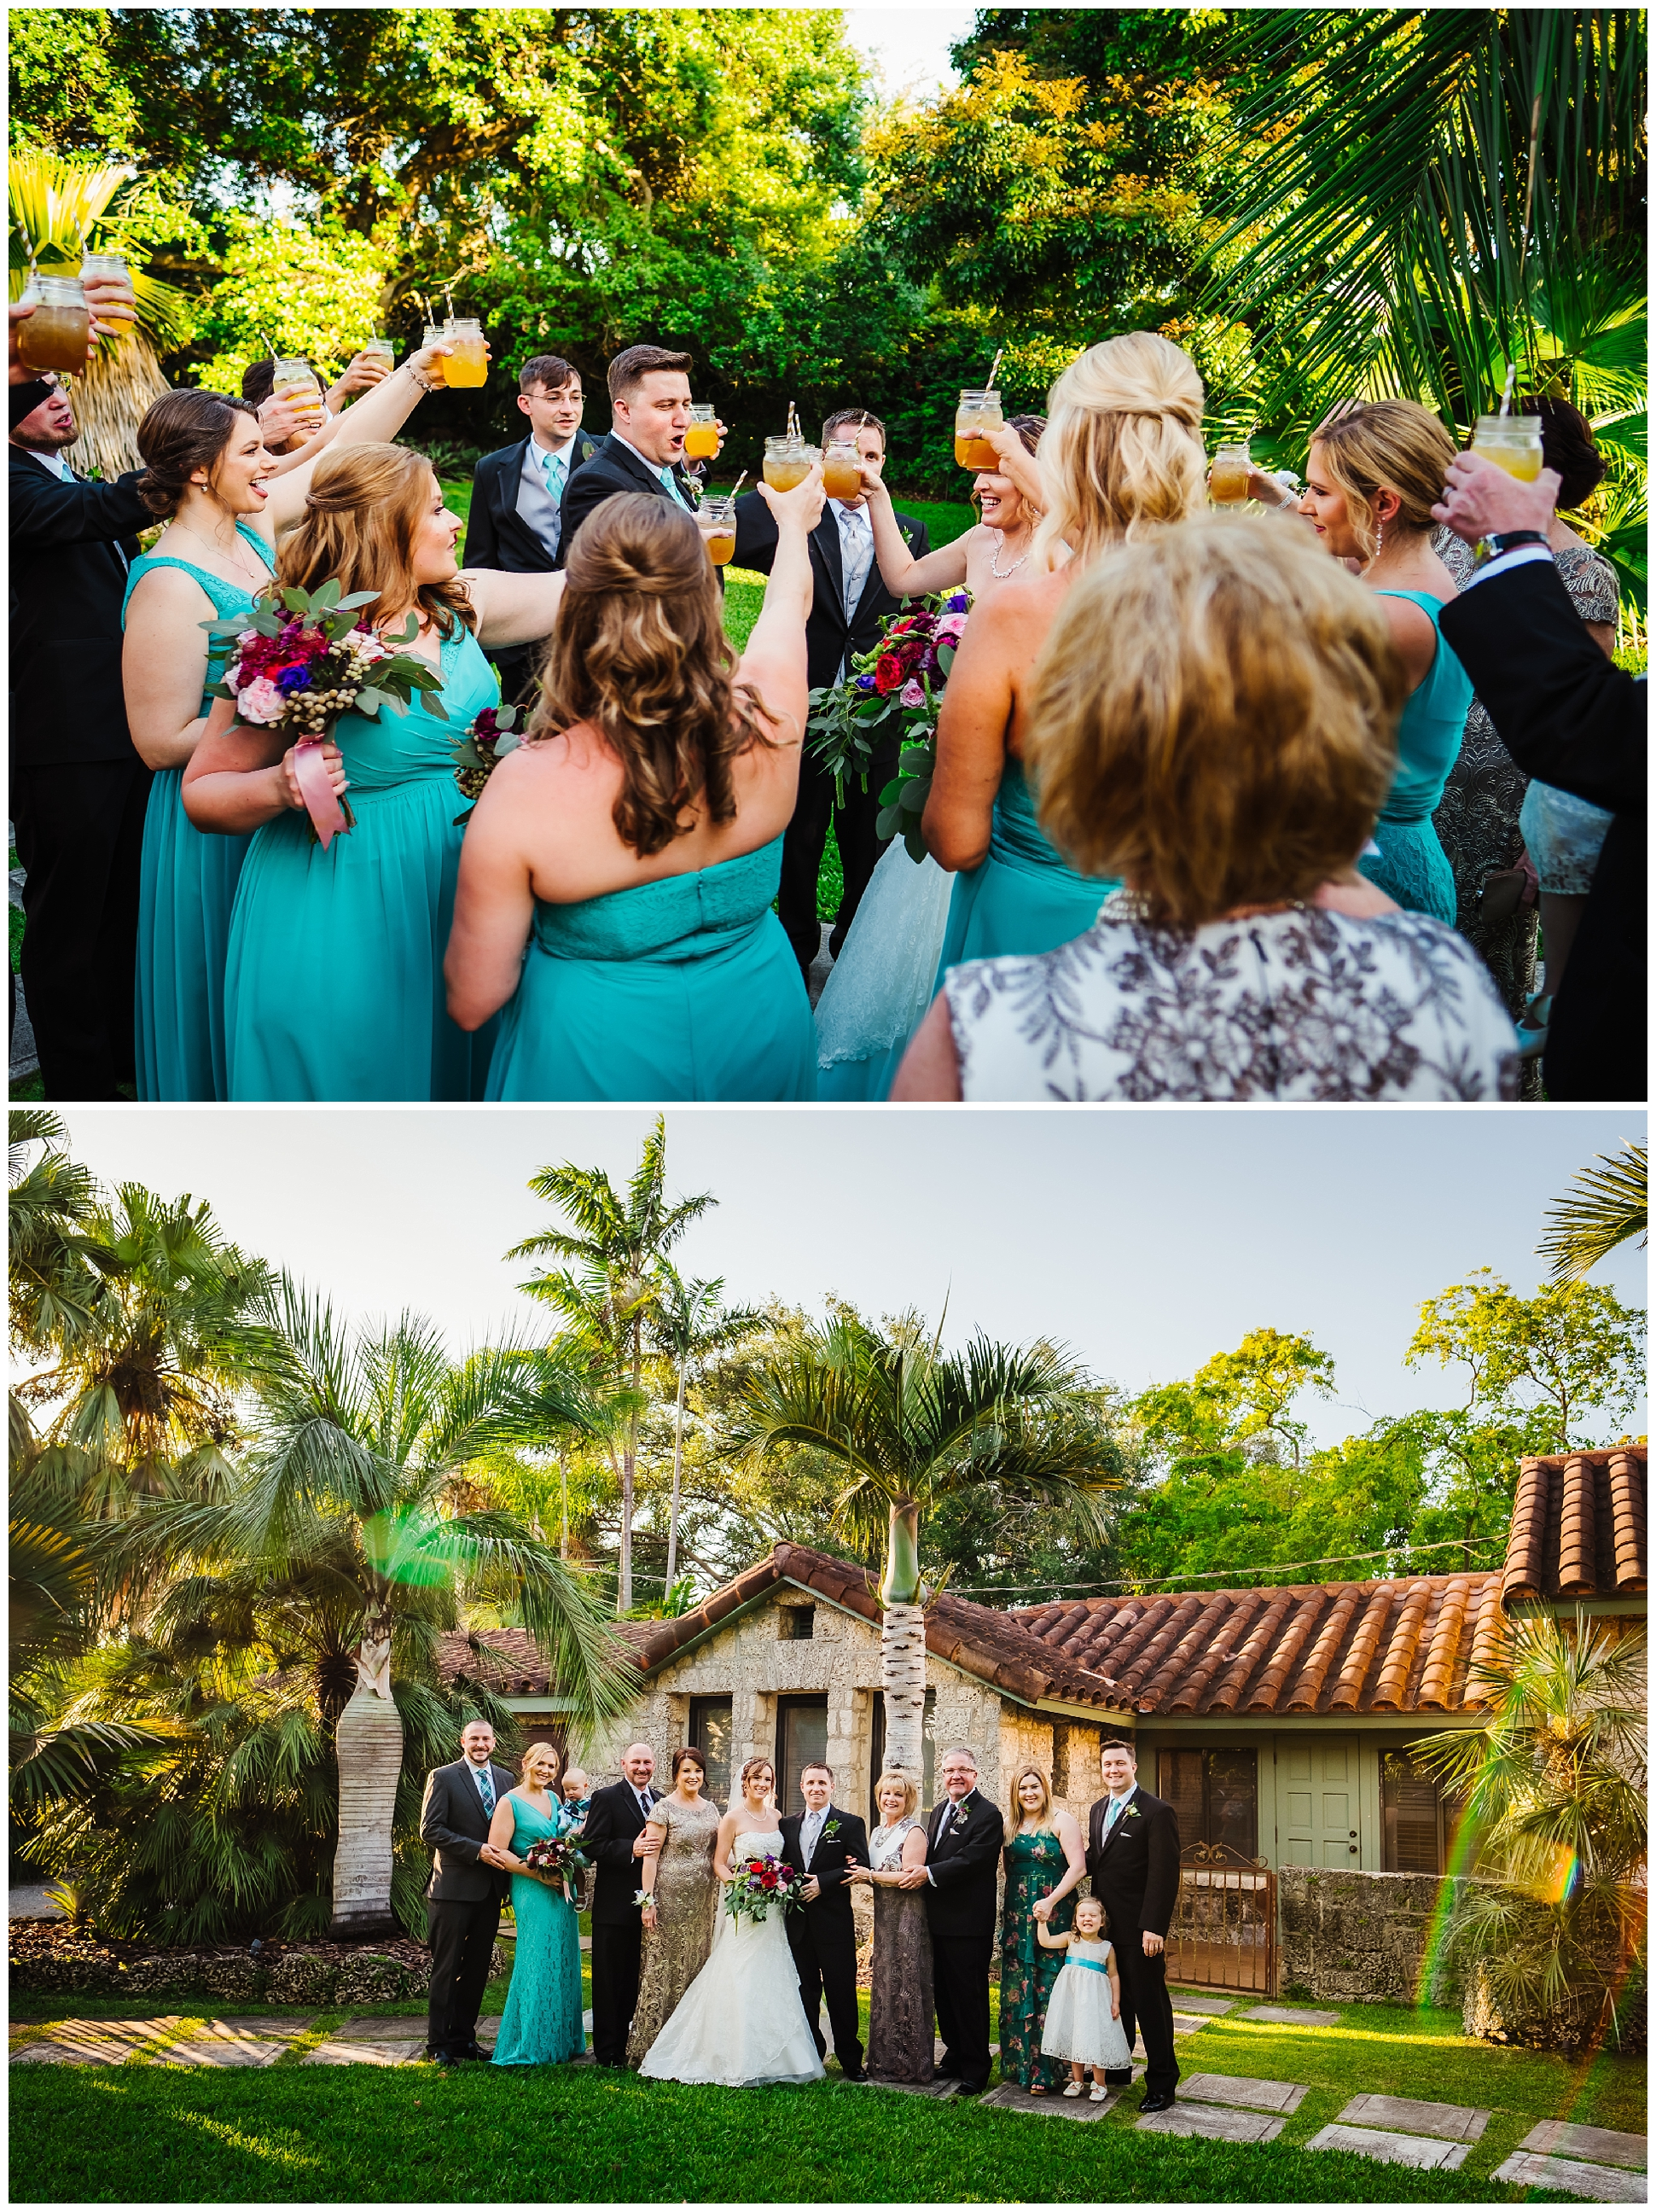 florida-destination-wedding-photographer-enchanted-tropical-miami-homestead-cooper-estate-teal_0056.jpg